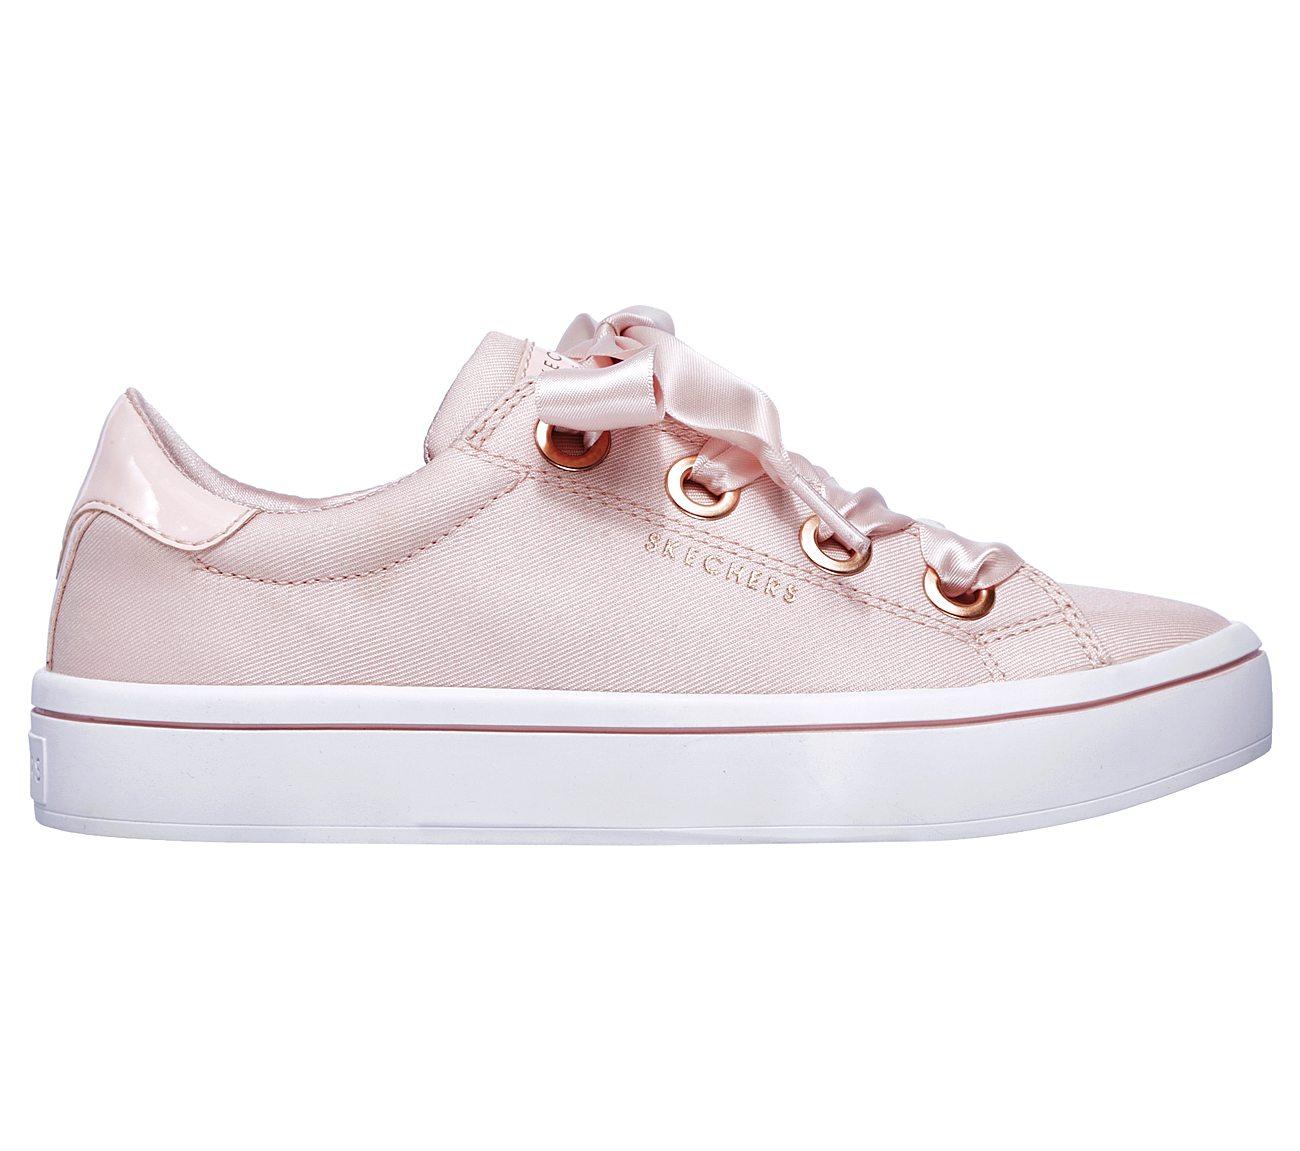 Skecher Lace Shoes